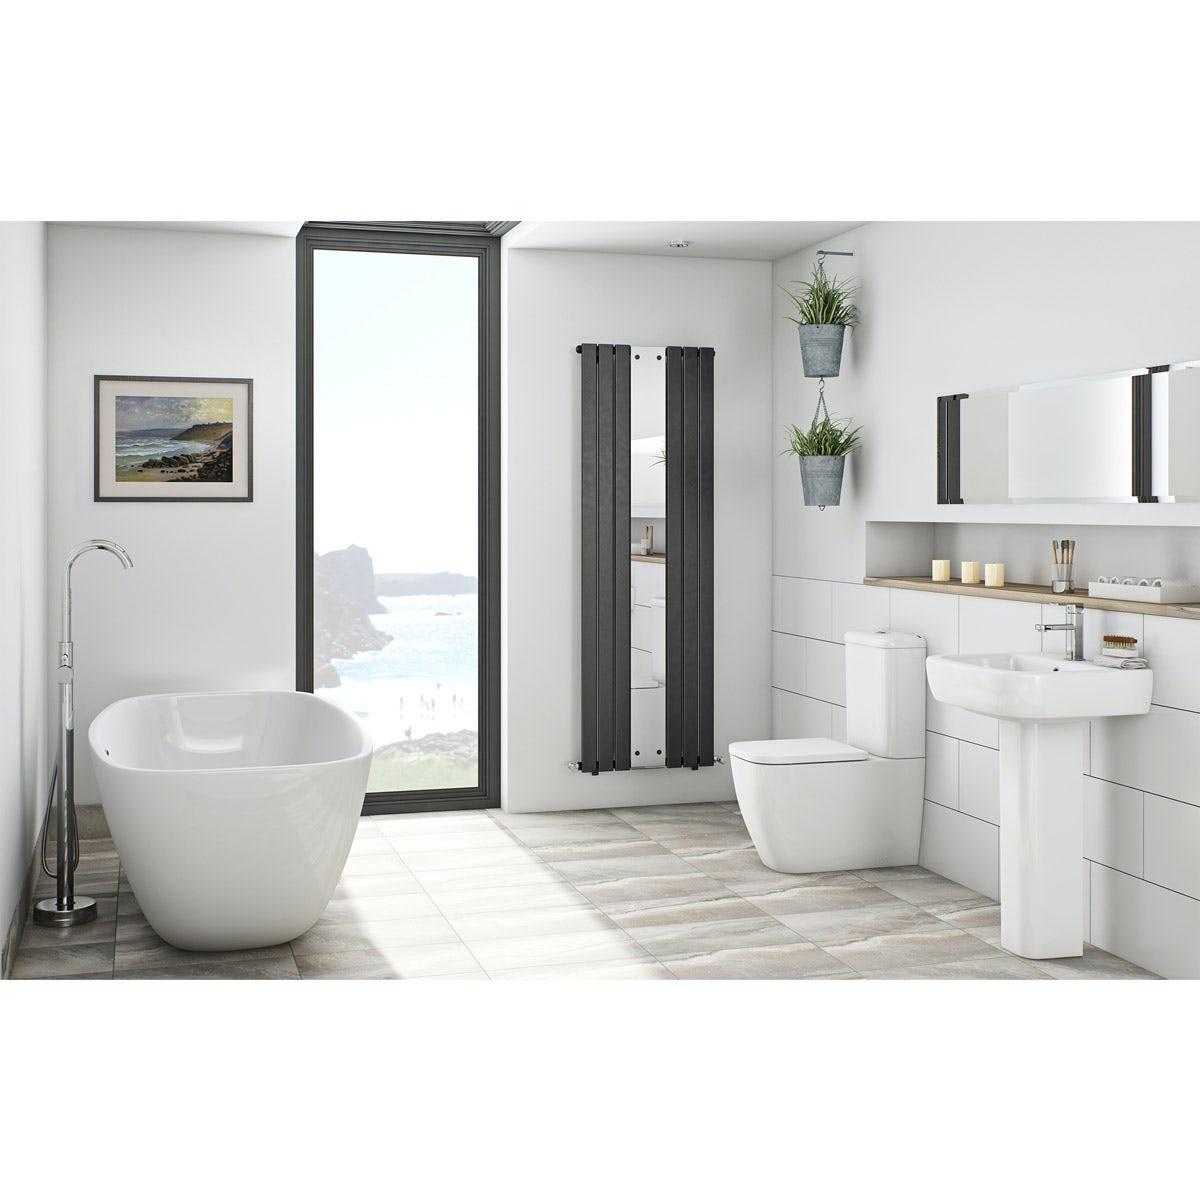 Mode Ellis bathroom suite with freestanding bath